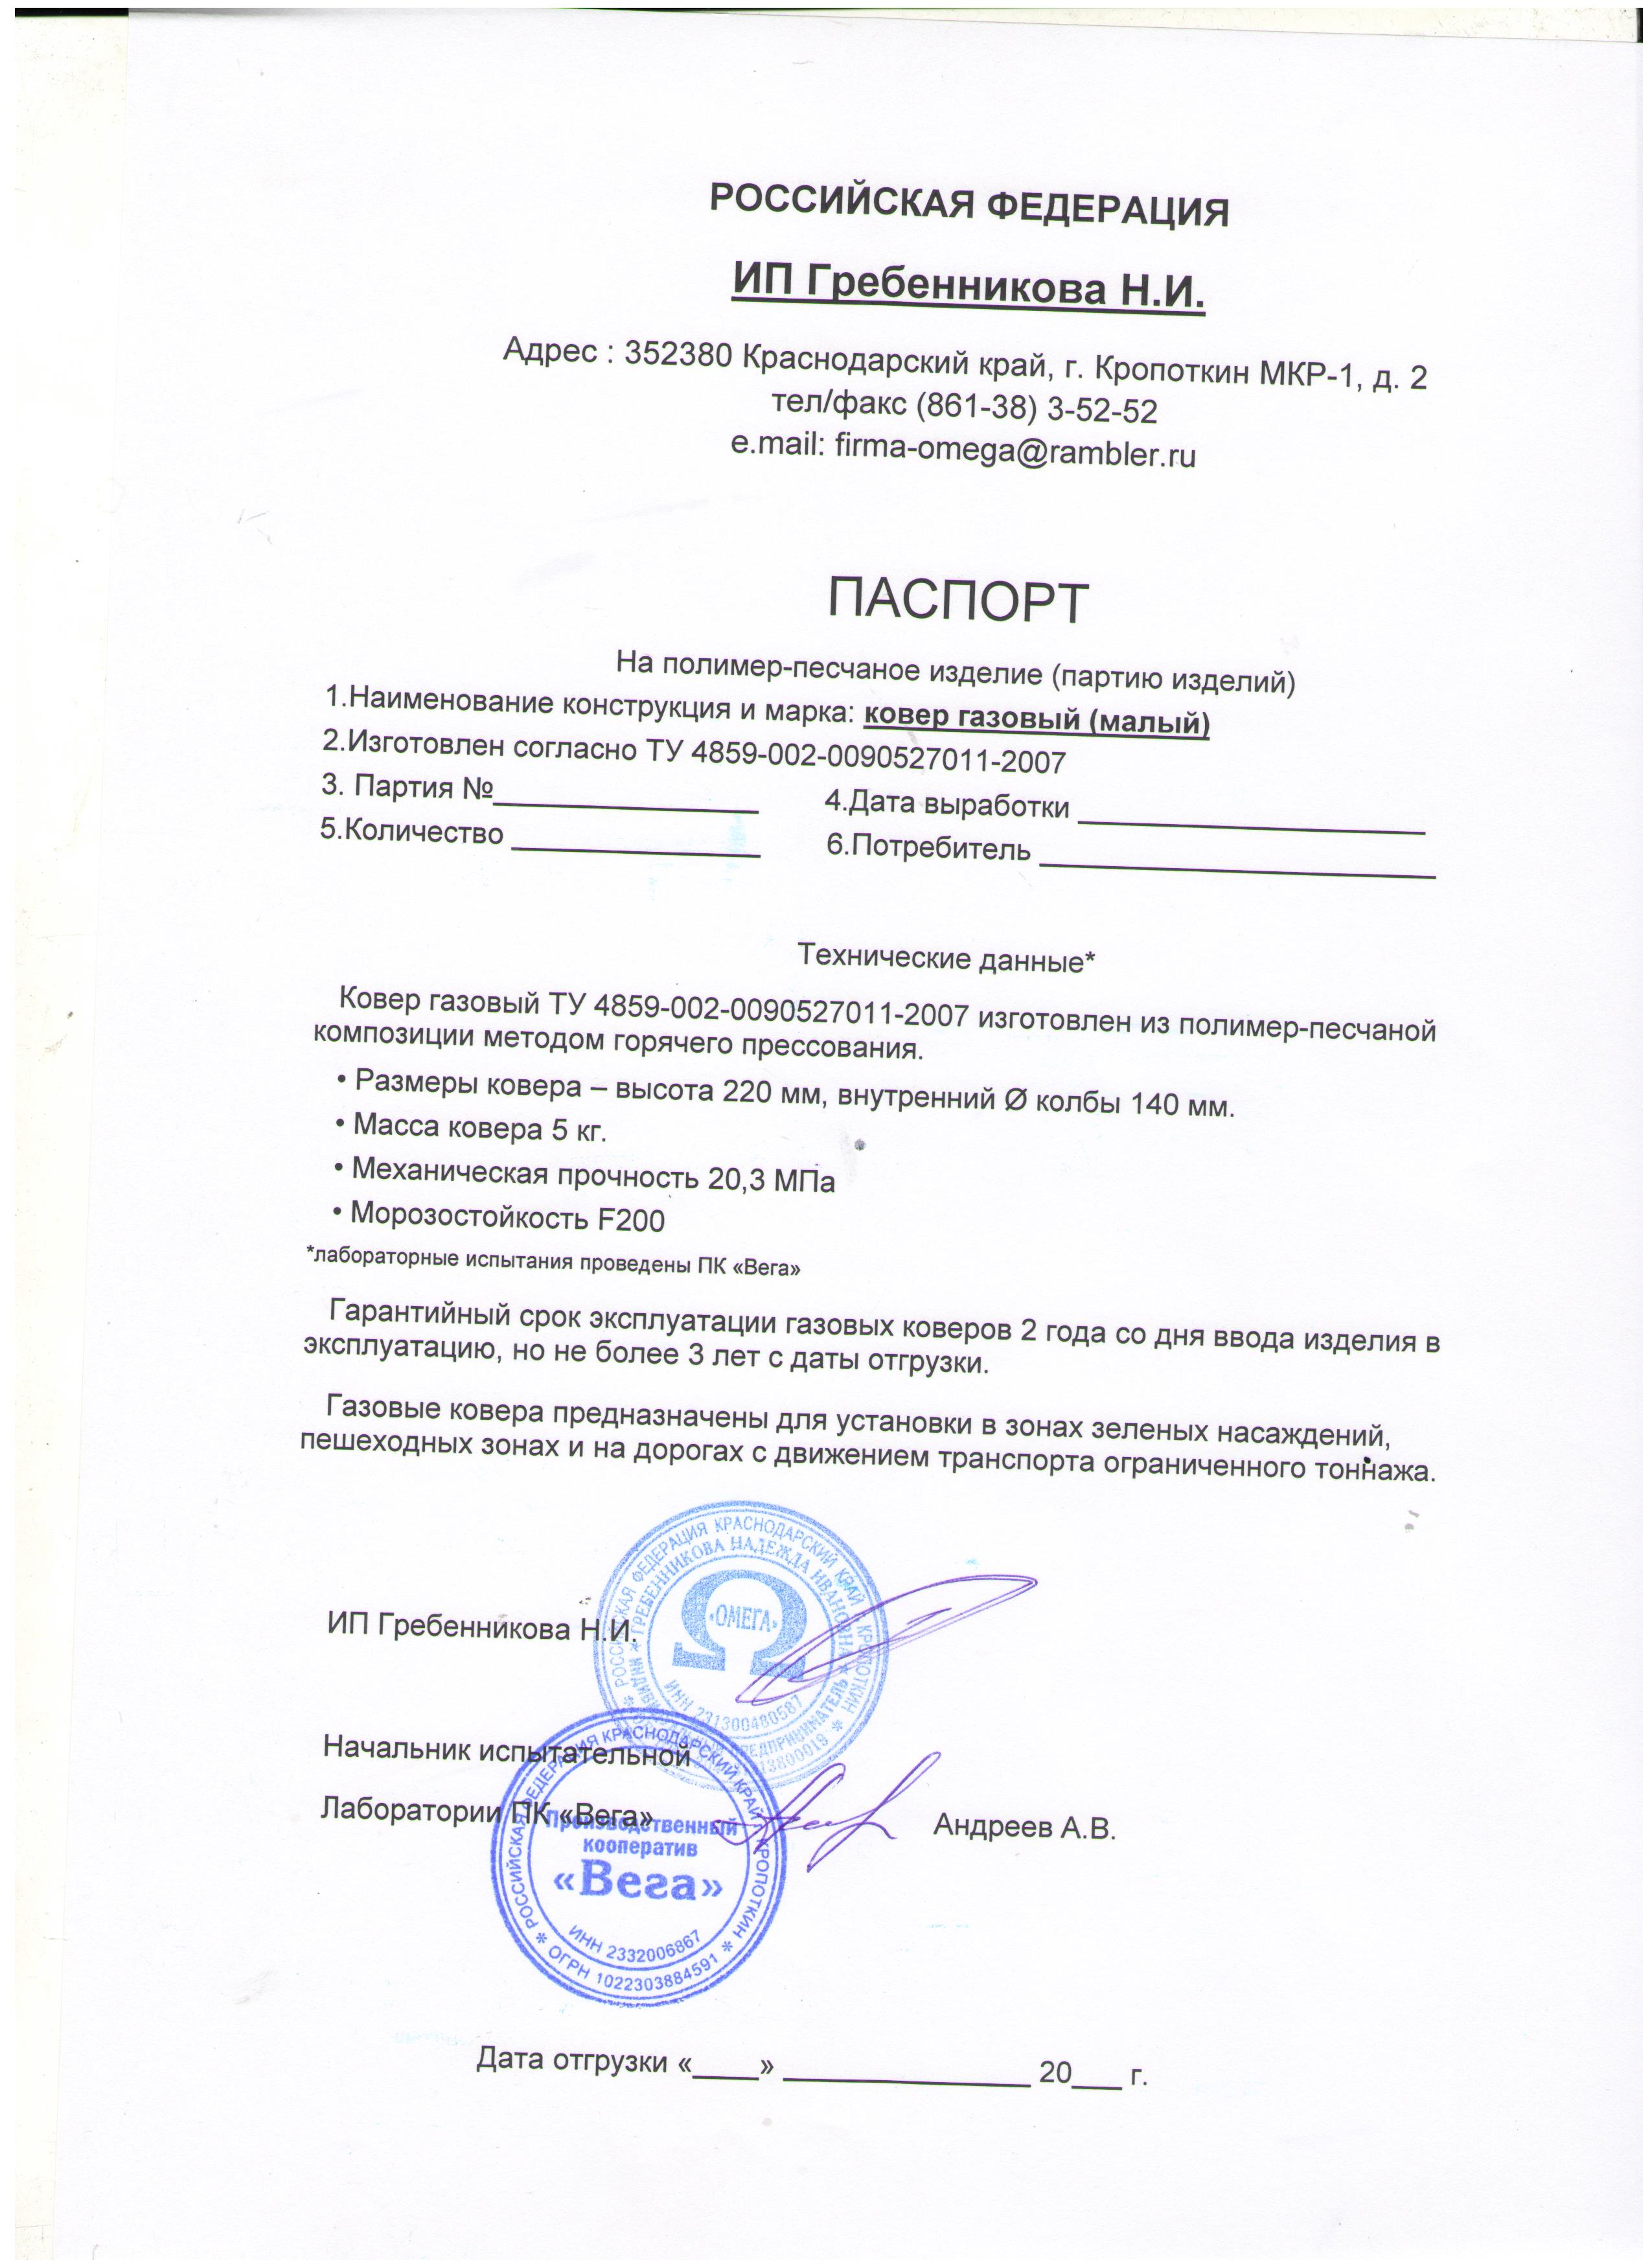 Сертификация ковера газового самара сертификация исо 9001